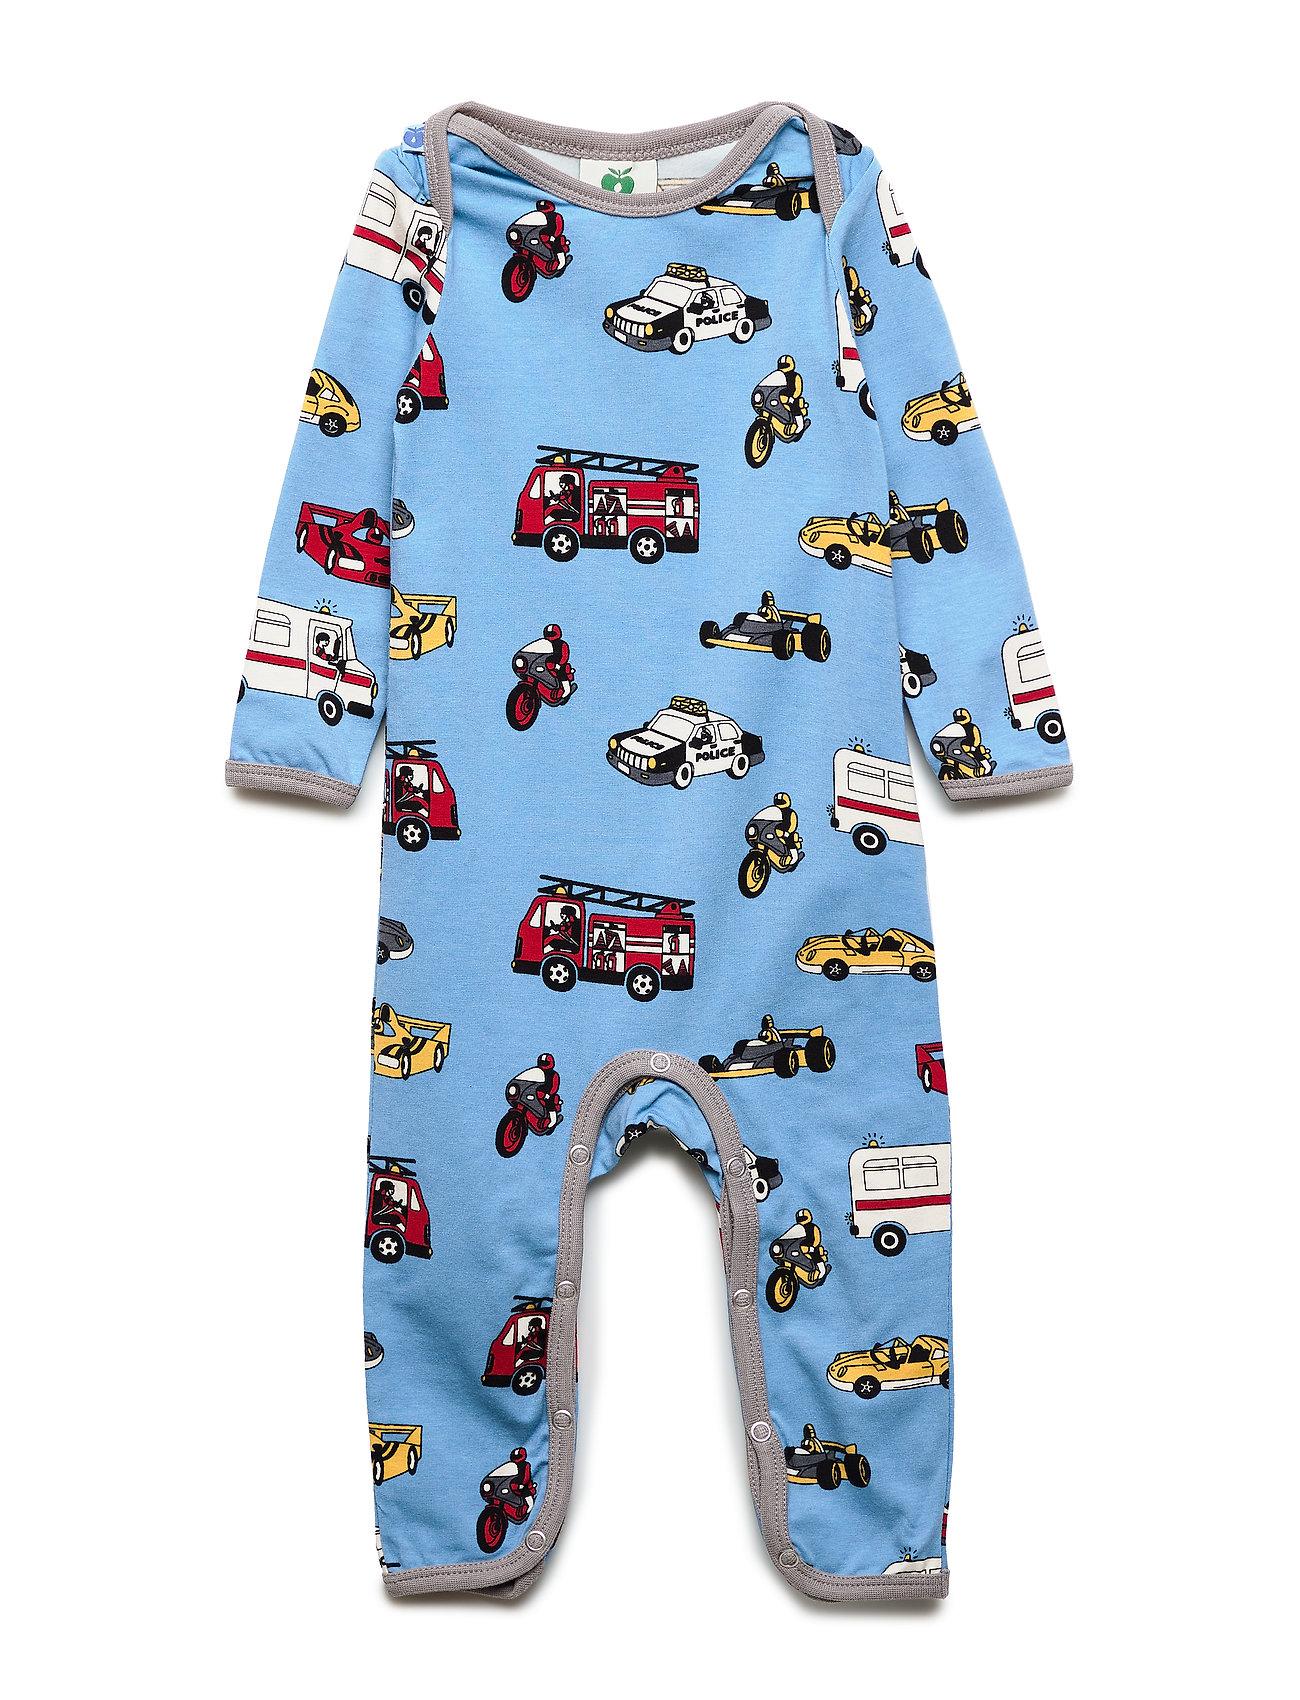 Småfolk Body Suit, Cars - WINTER BLUE